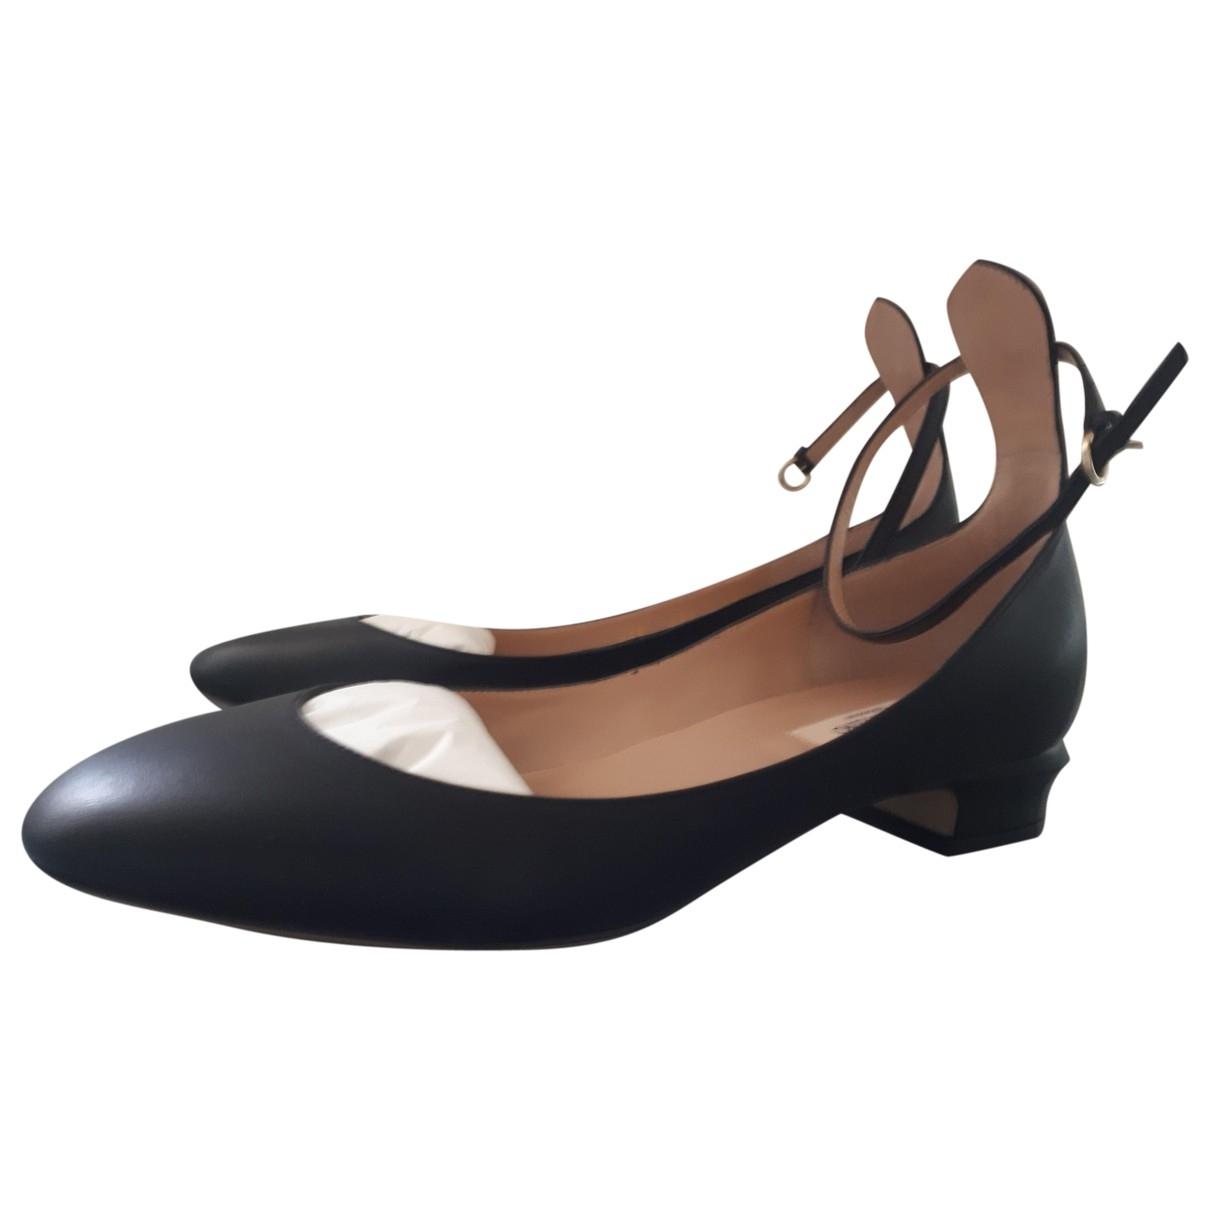 Valentino Garavani - Ballerines   pour femme en cuir - noir